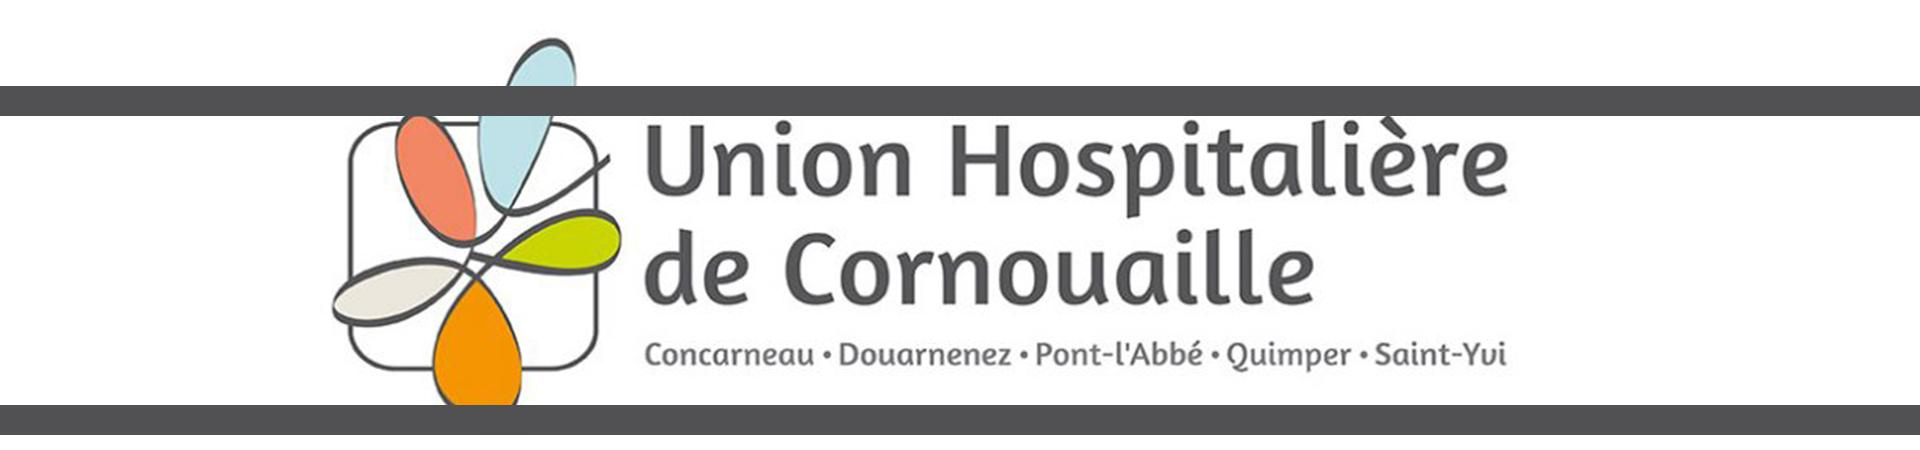 Union Hospitalière de Cornouaille